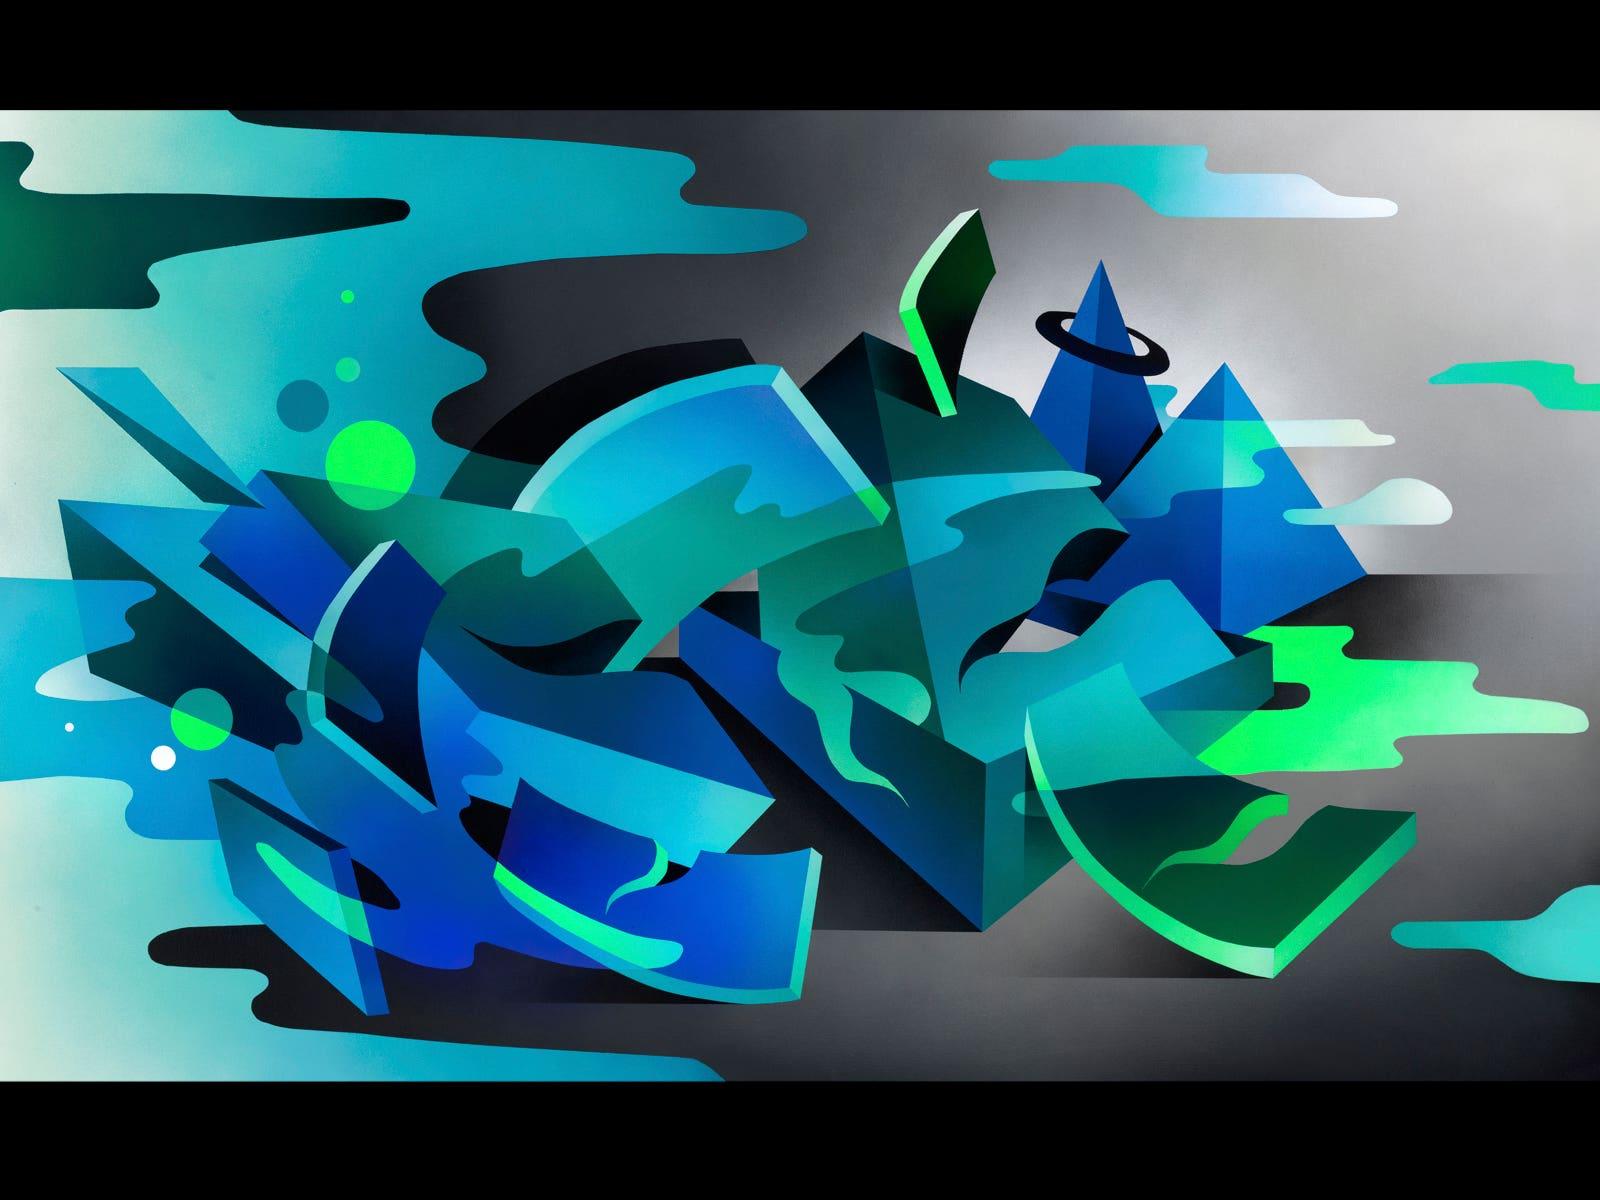 Image courtesy Maddox Gallery, Artist: Mikael B